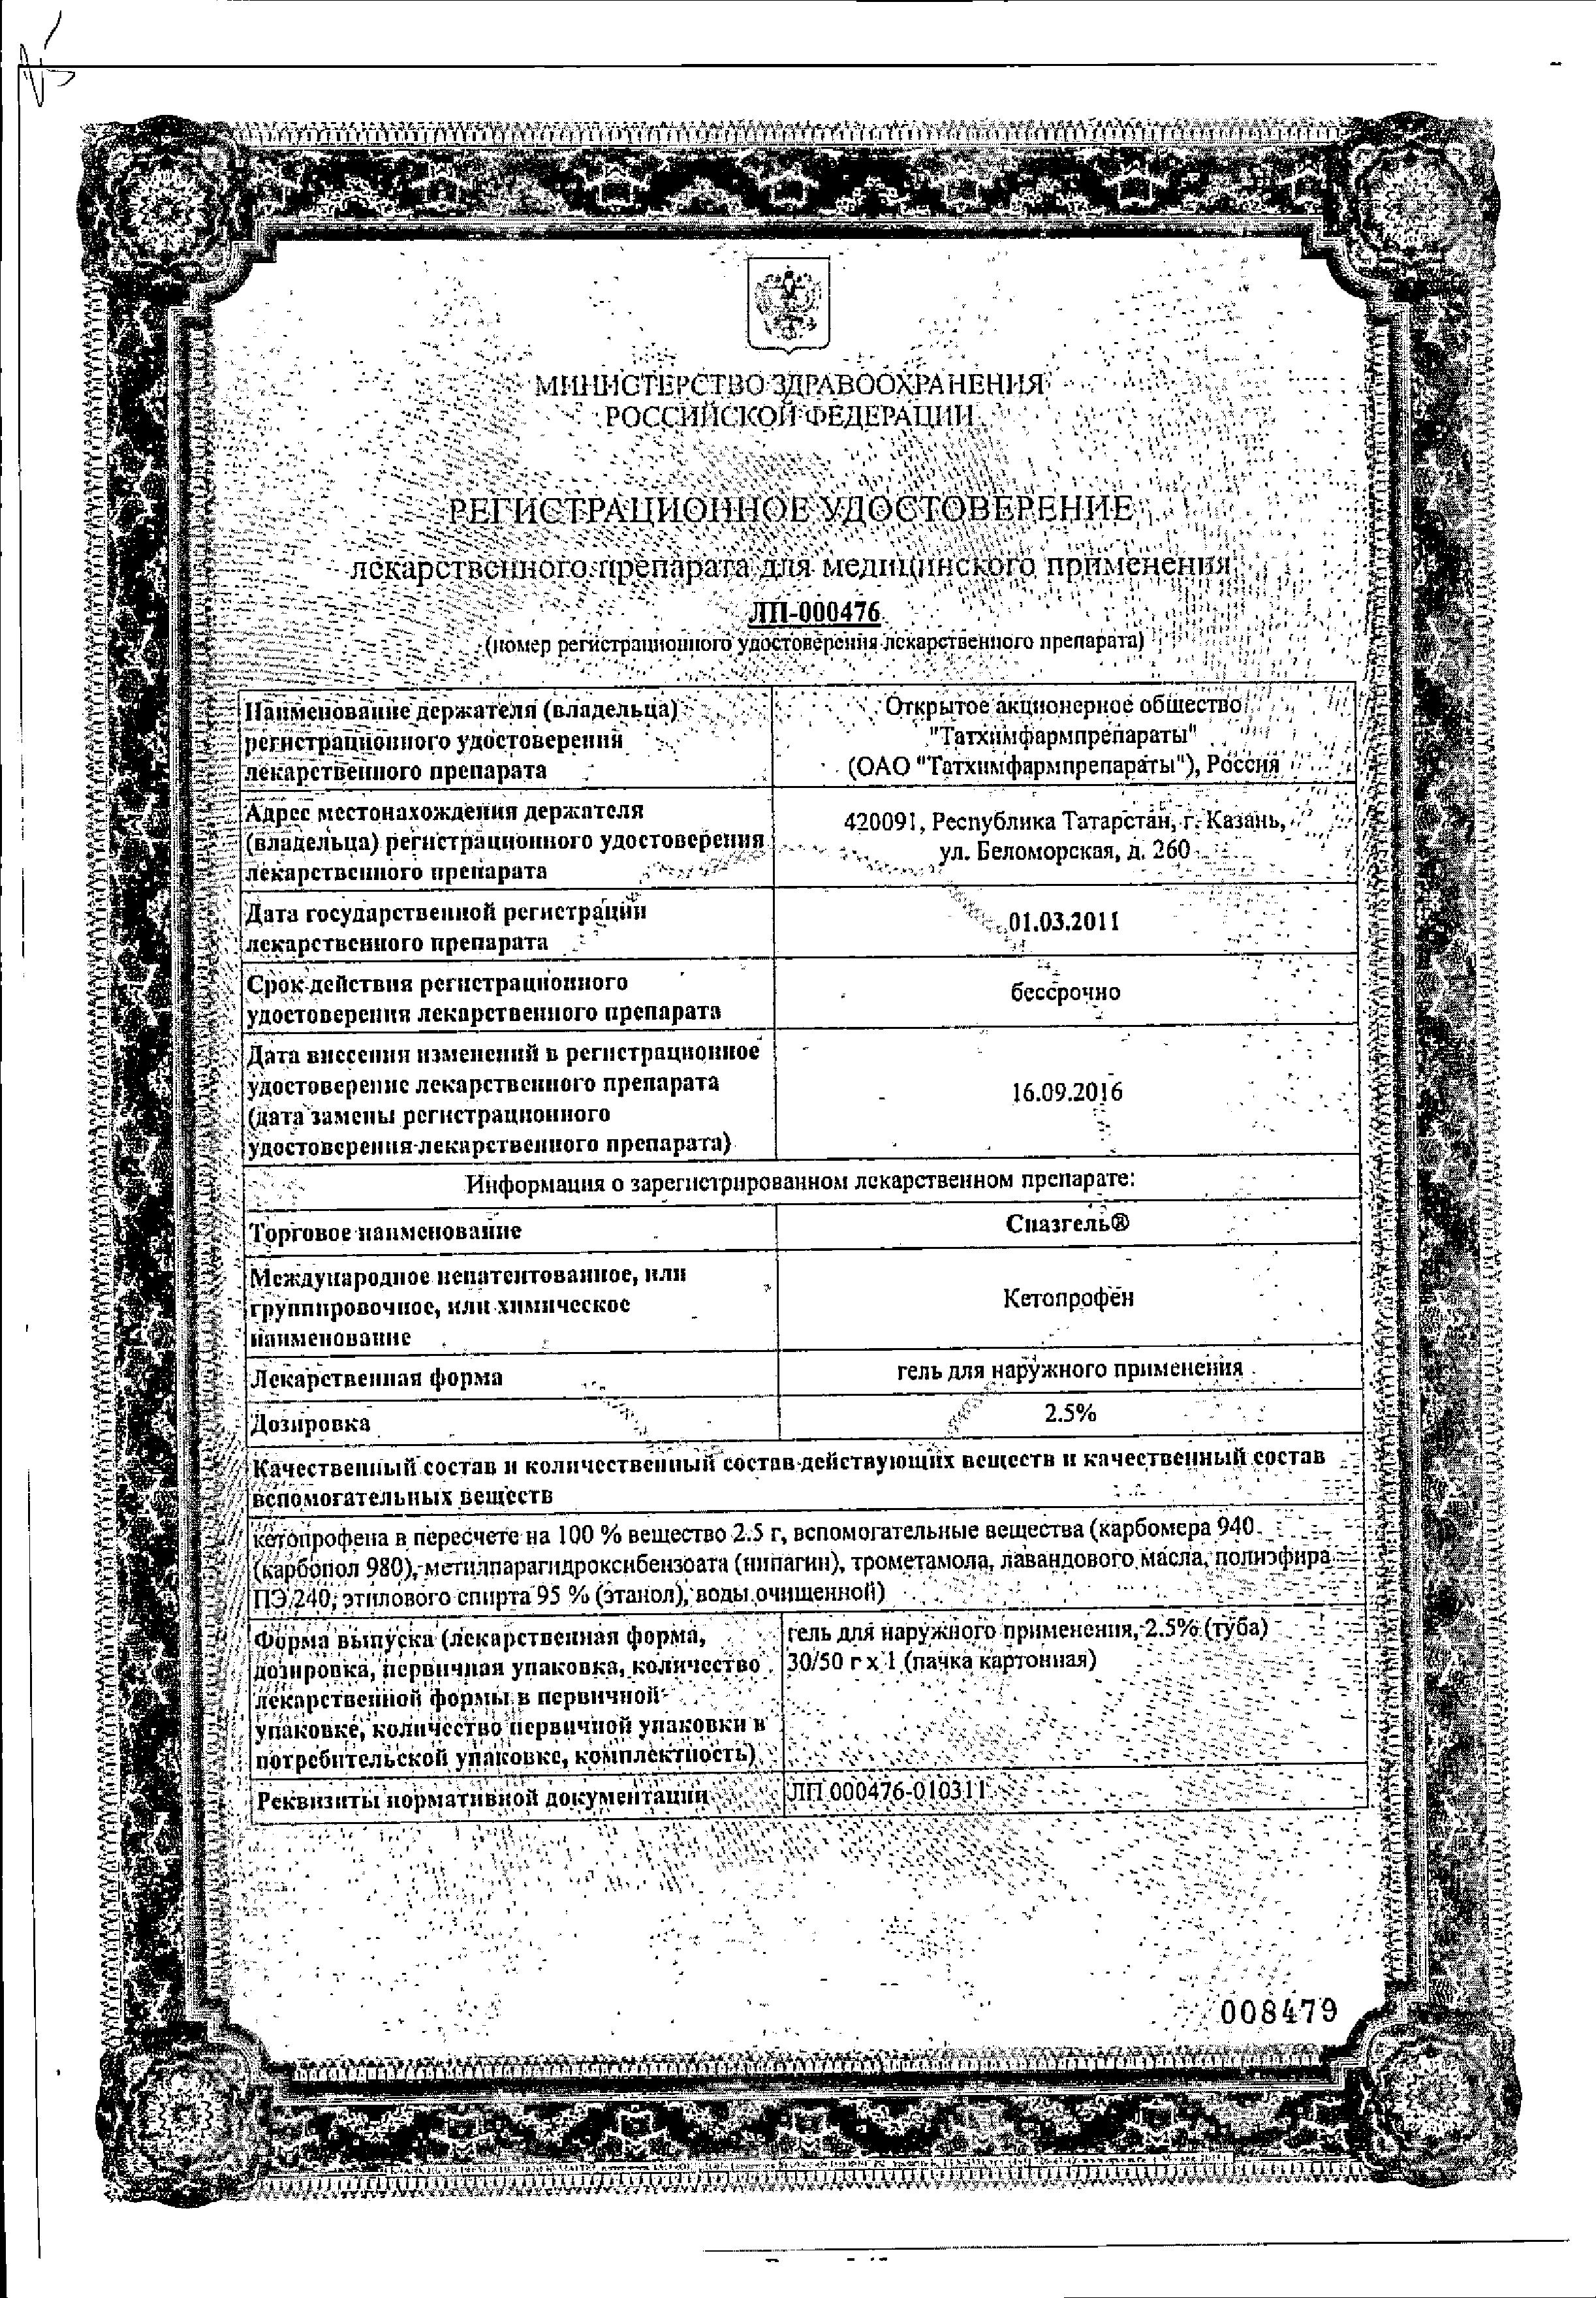 Спазгель сертификат